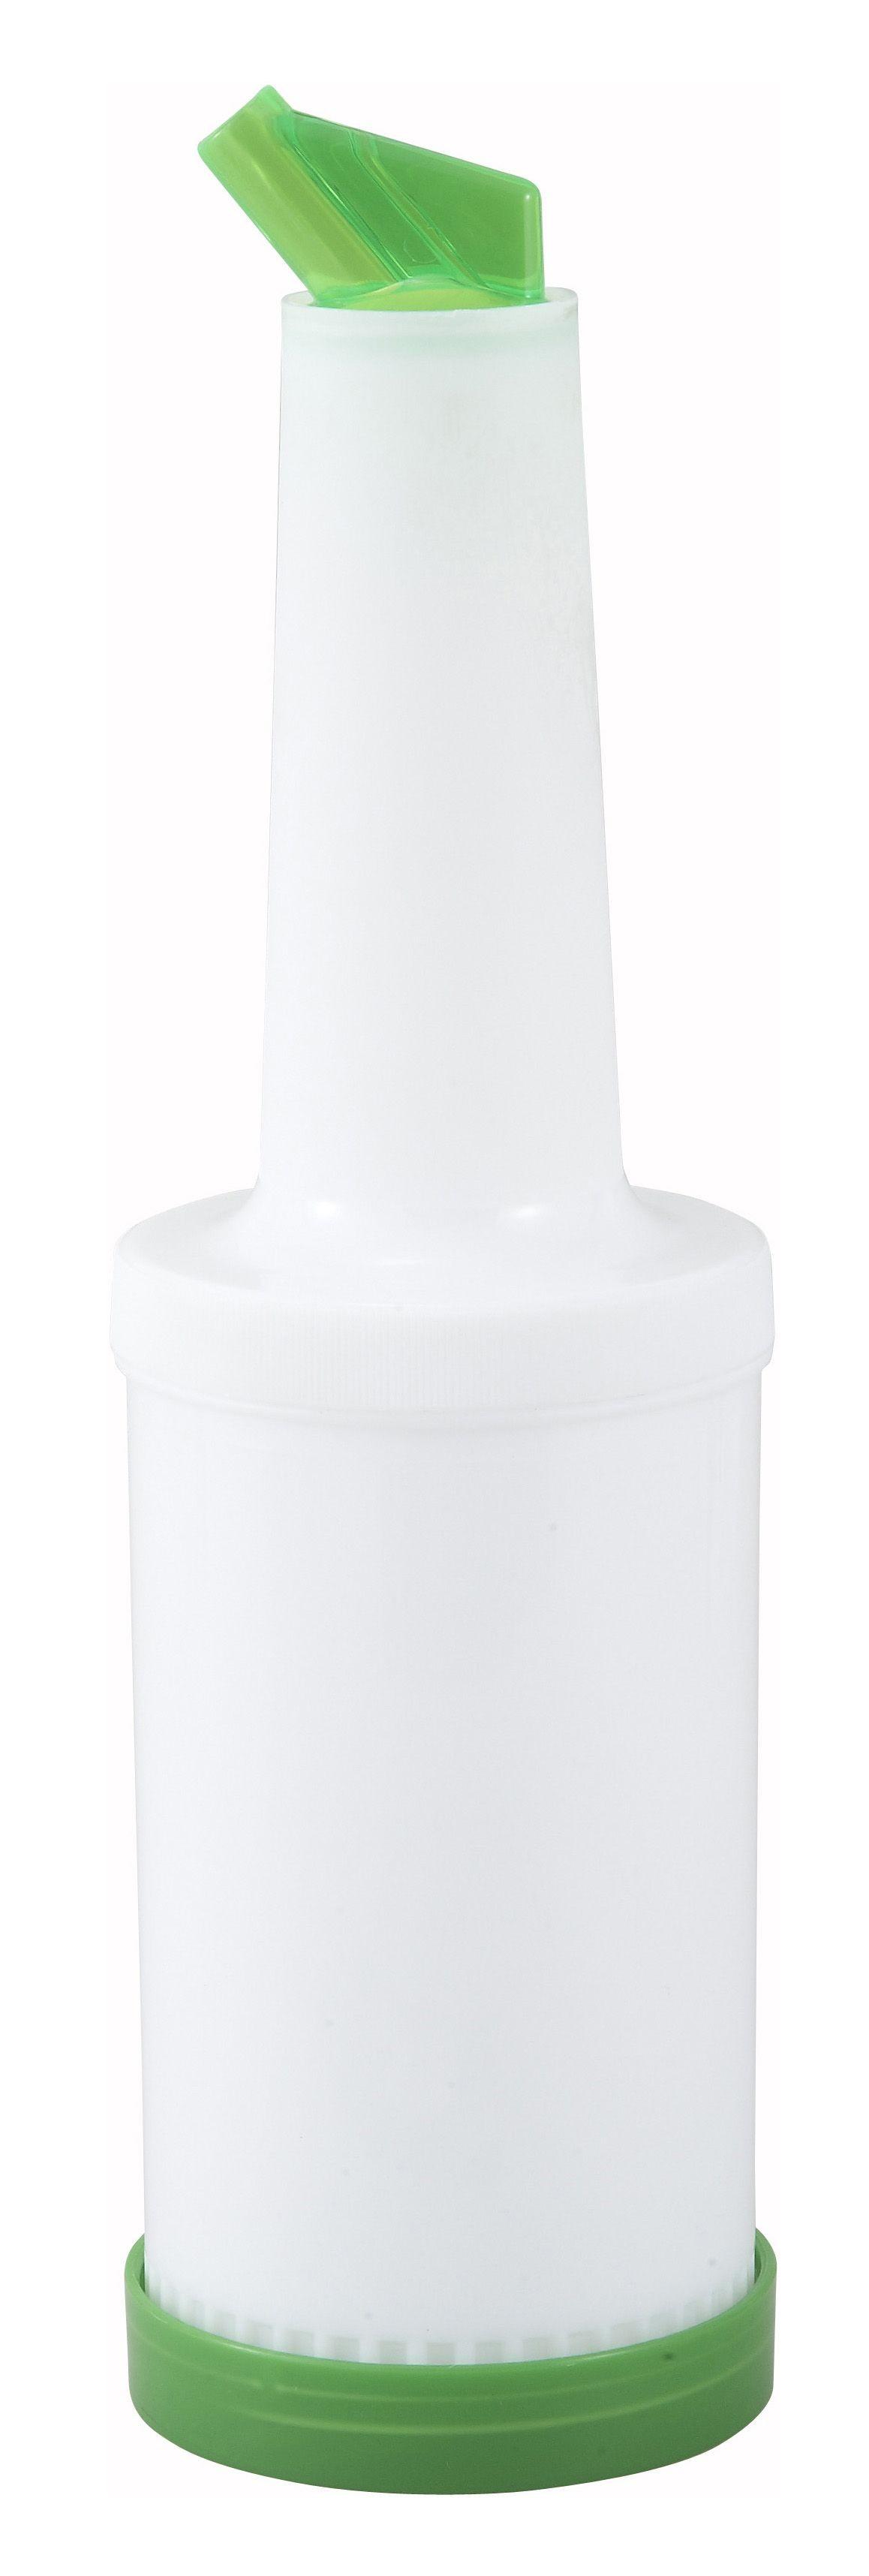 Winco PPB-1G Liquor and Juice Multi-Pour Bottle with Green Spout and Lid 1 Qt.